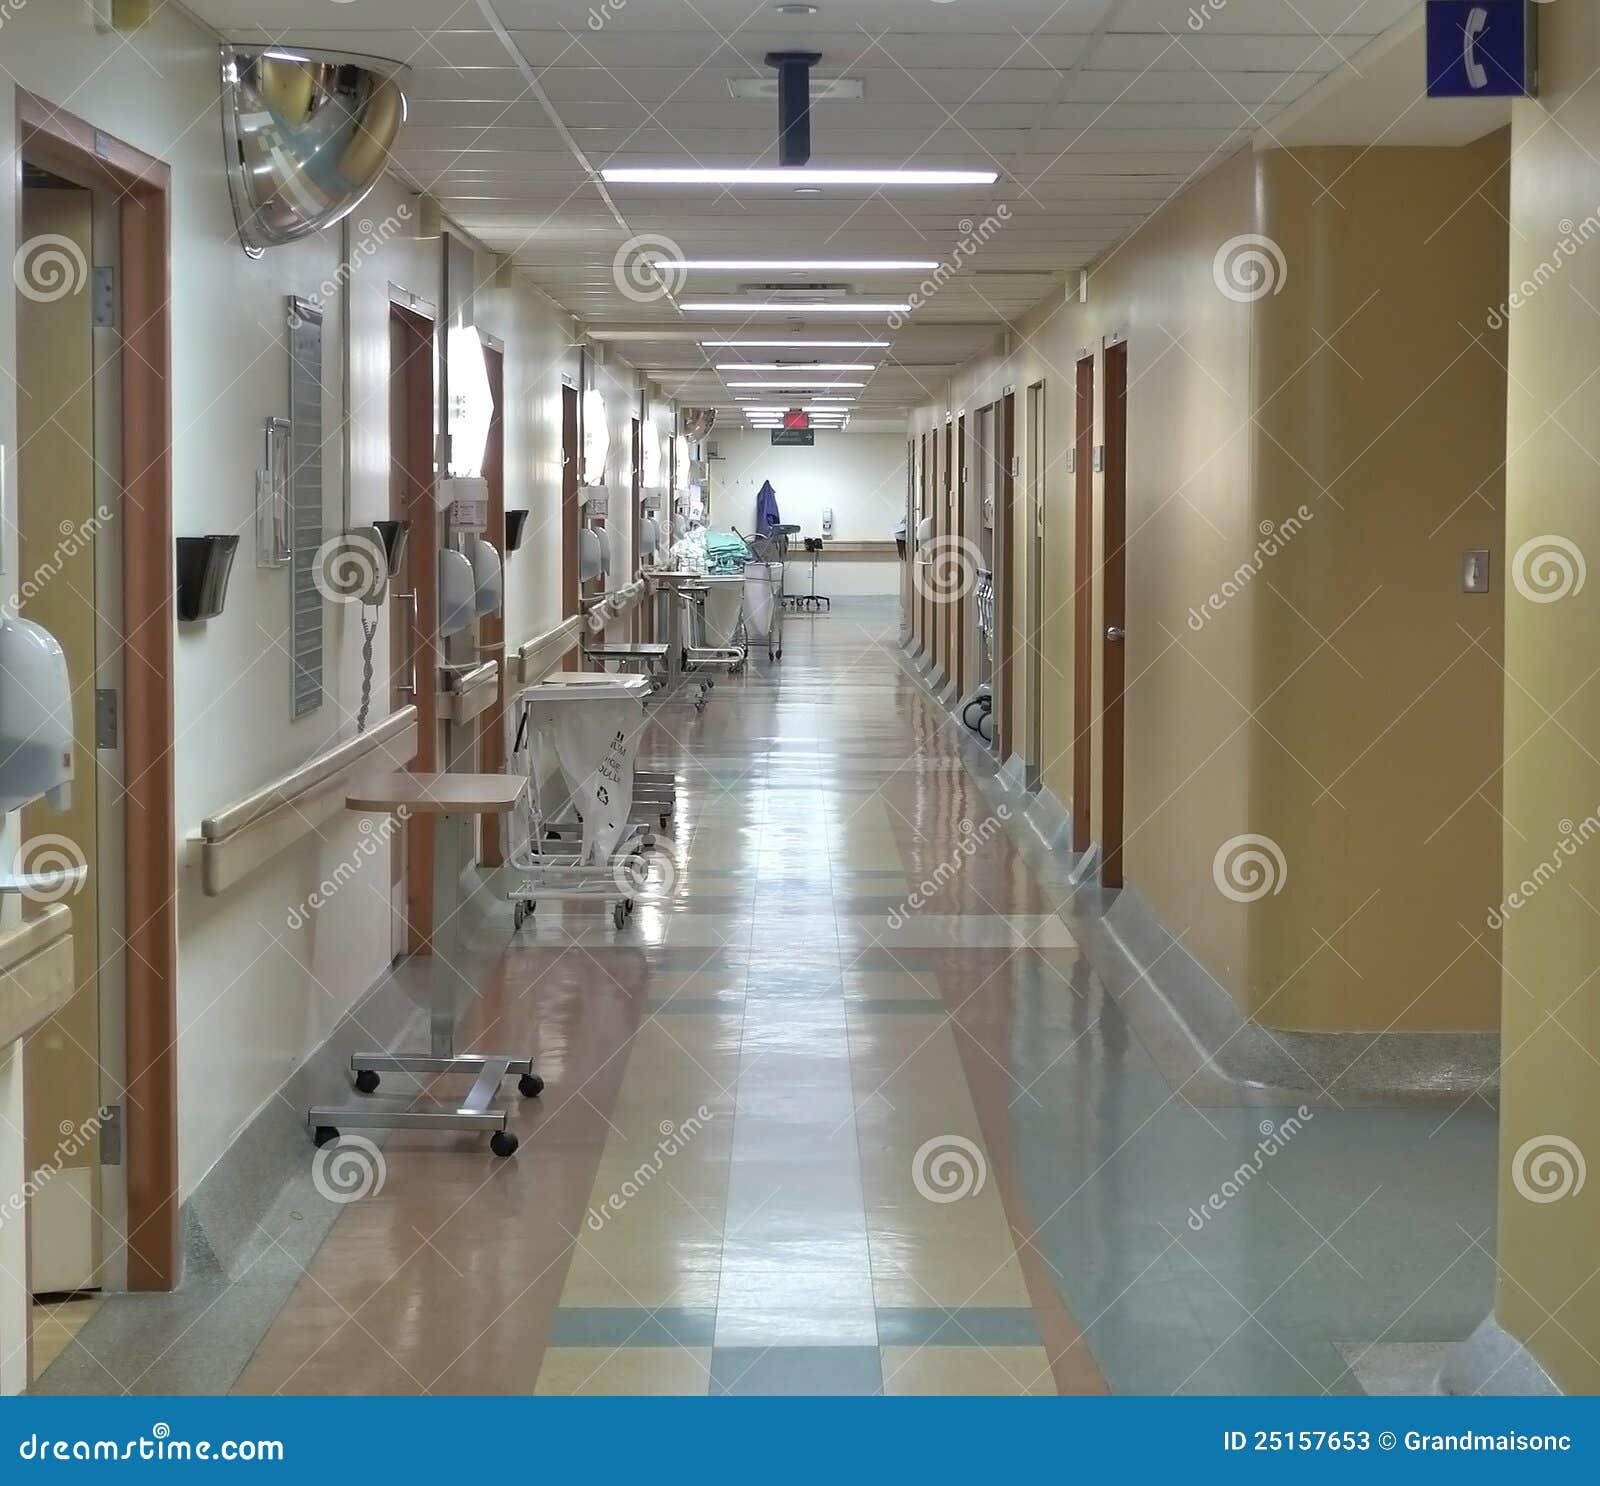 Maternity Hospital Floor Plan: Hospital Corridor Stock Photos